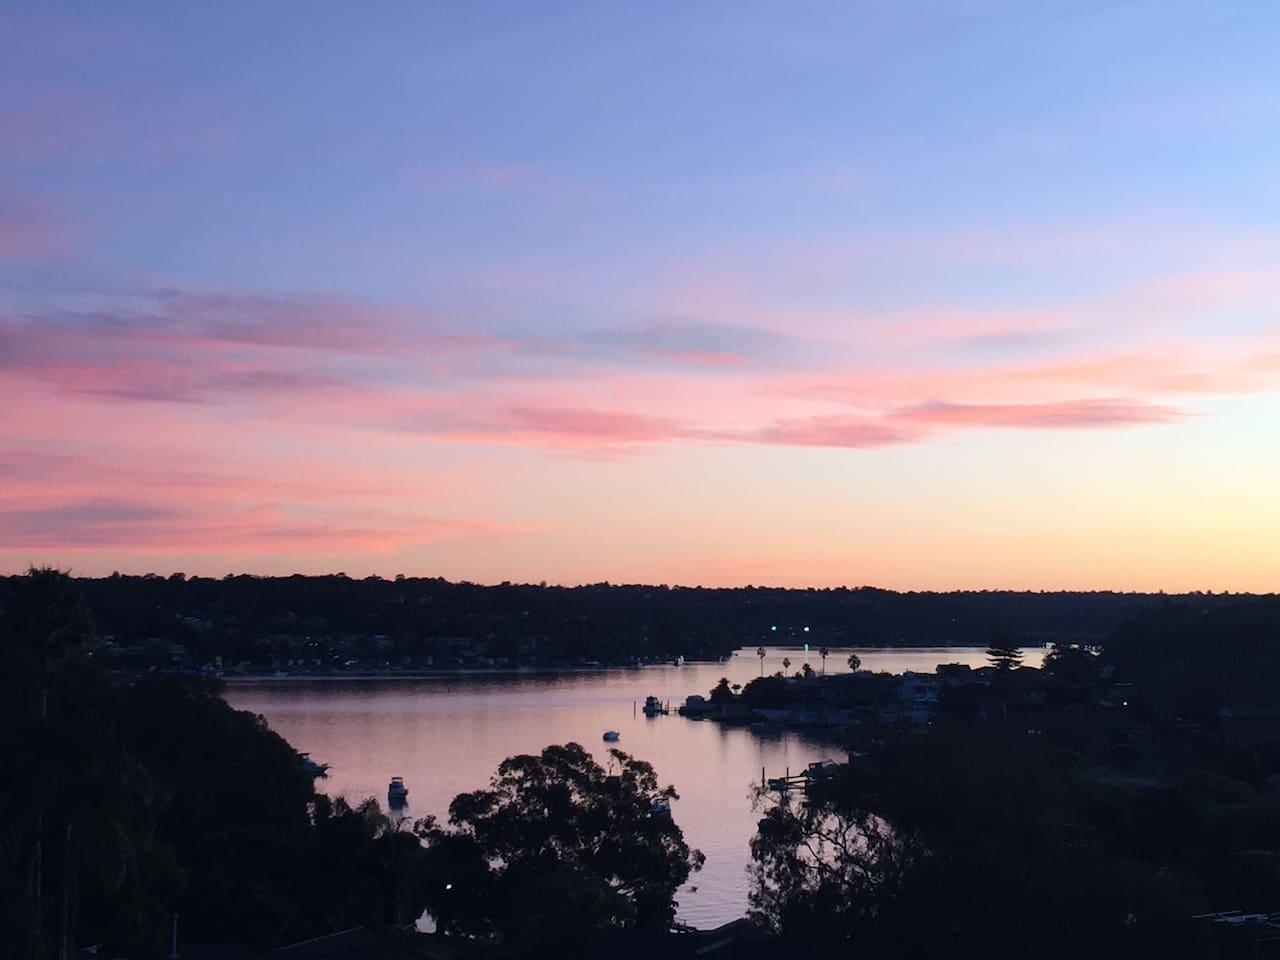 Enjoy a beautiful sunset everyday